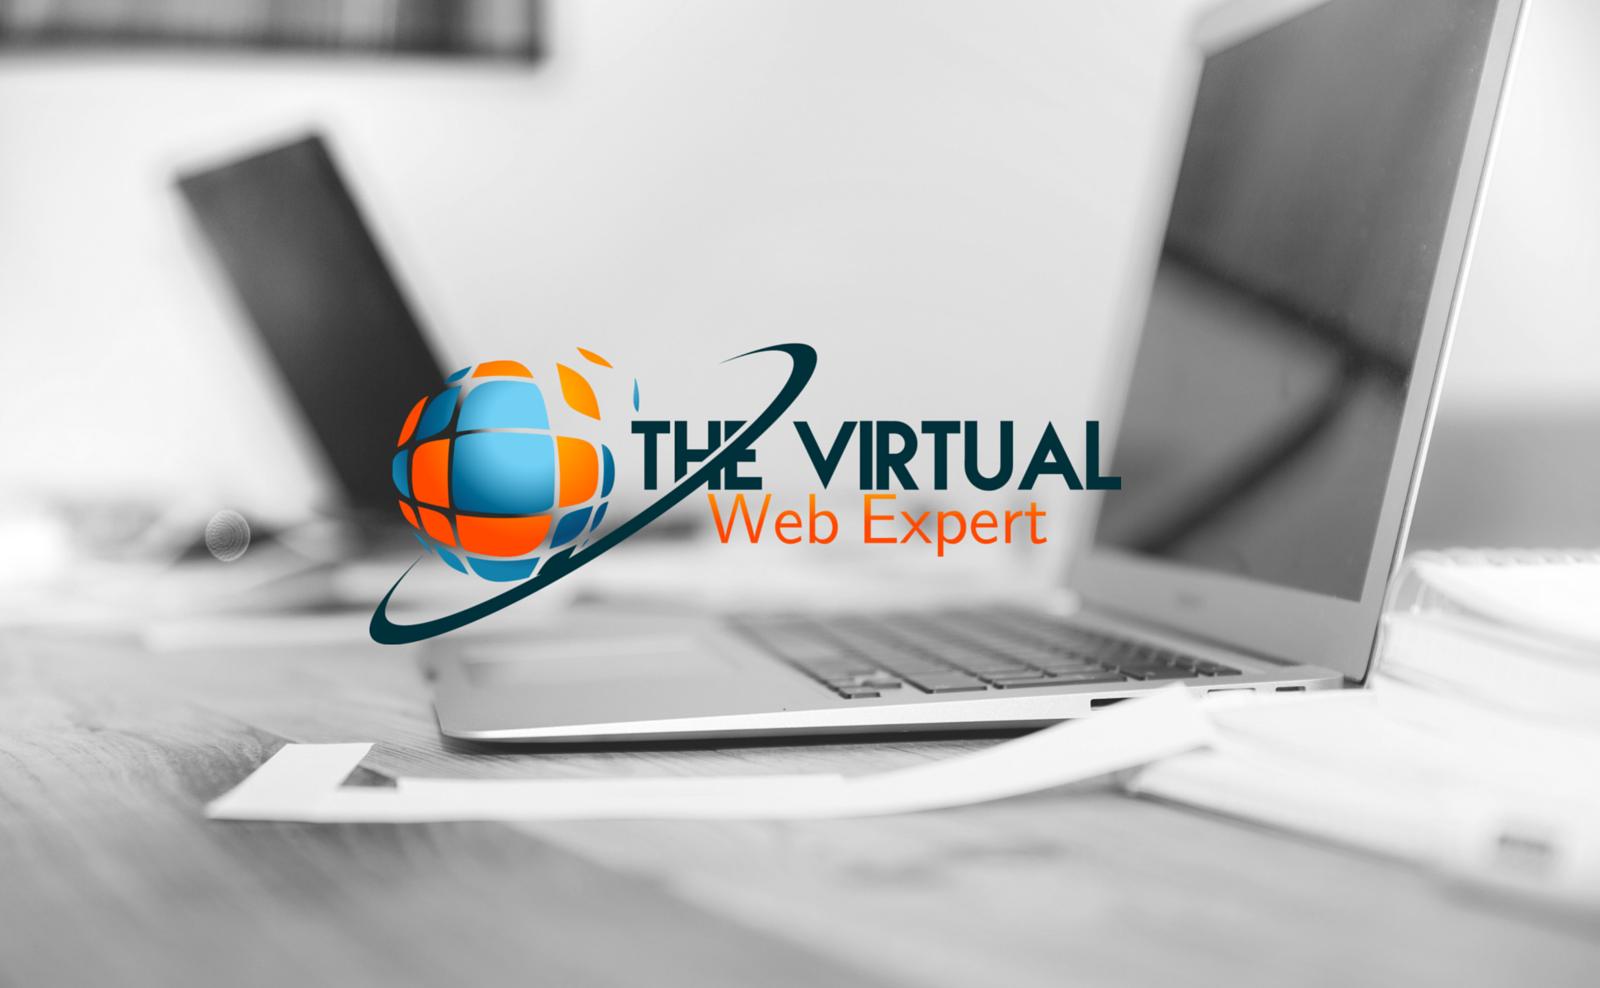 The Virtual Web Expert Inc